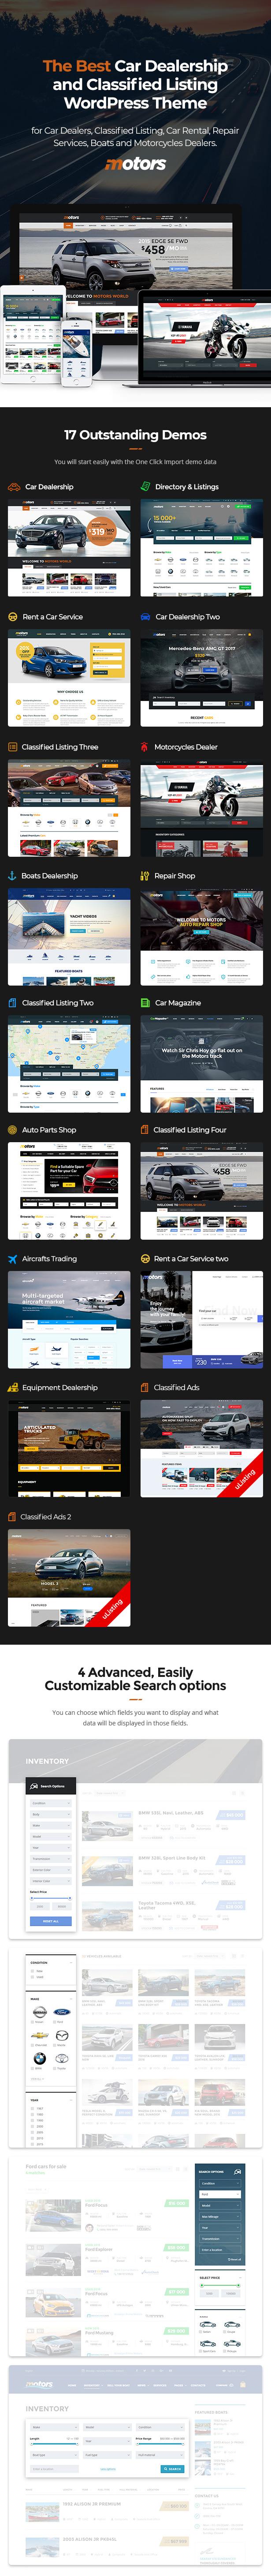 Motors - Car Dealer & Automotive Listing - 4